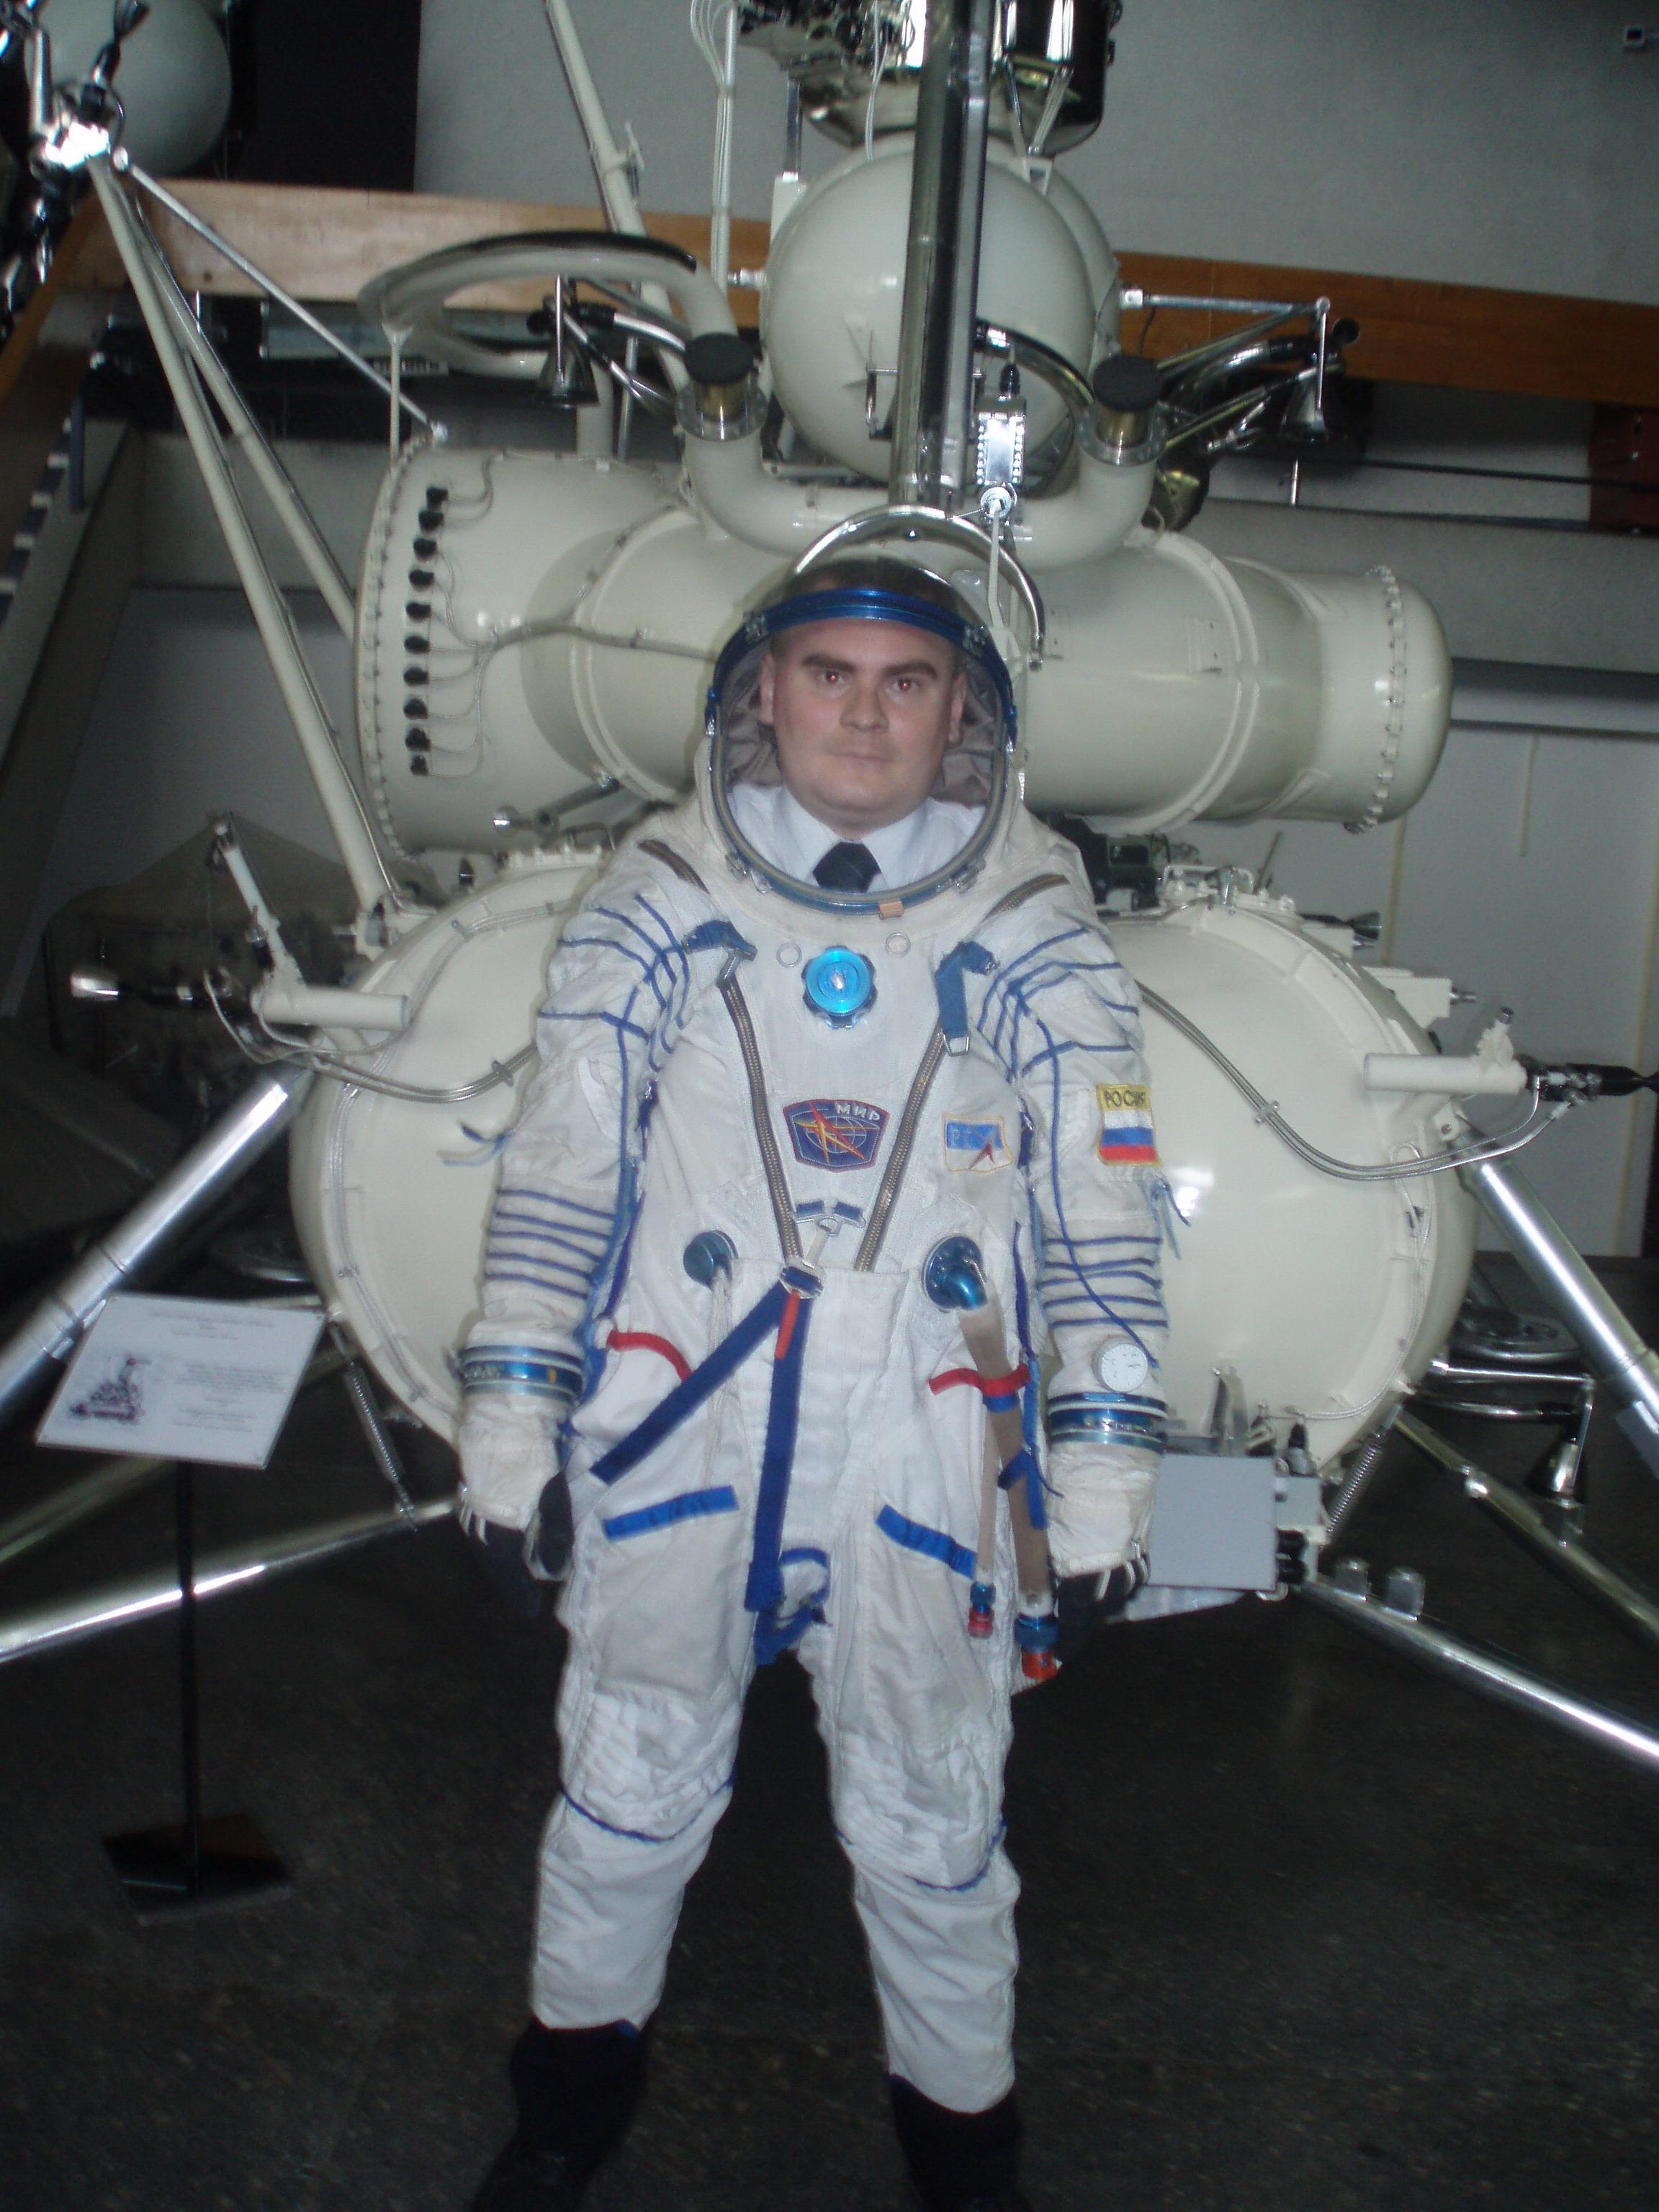 Amazoncom Adventuring Astronaut Childrens Halloween